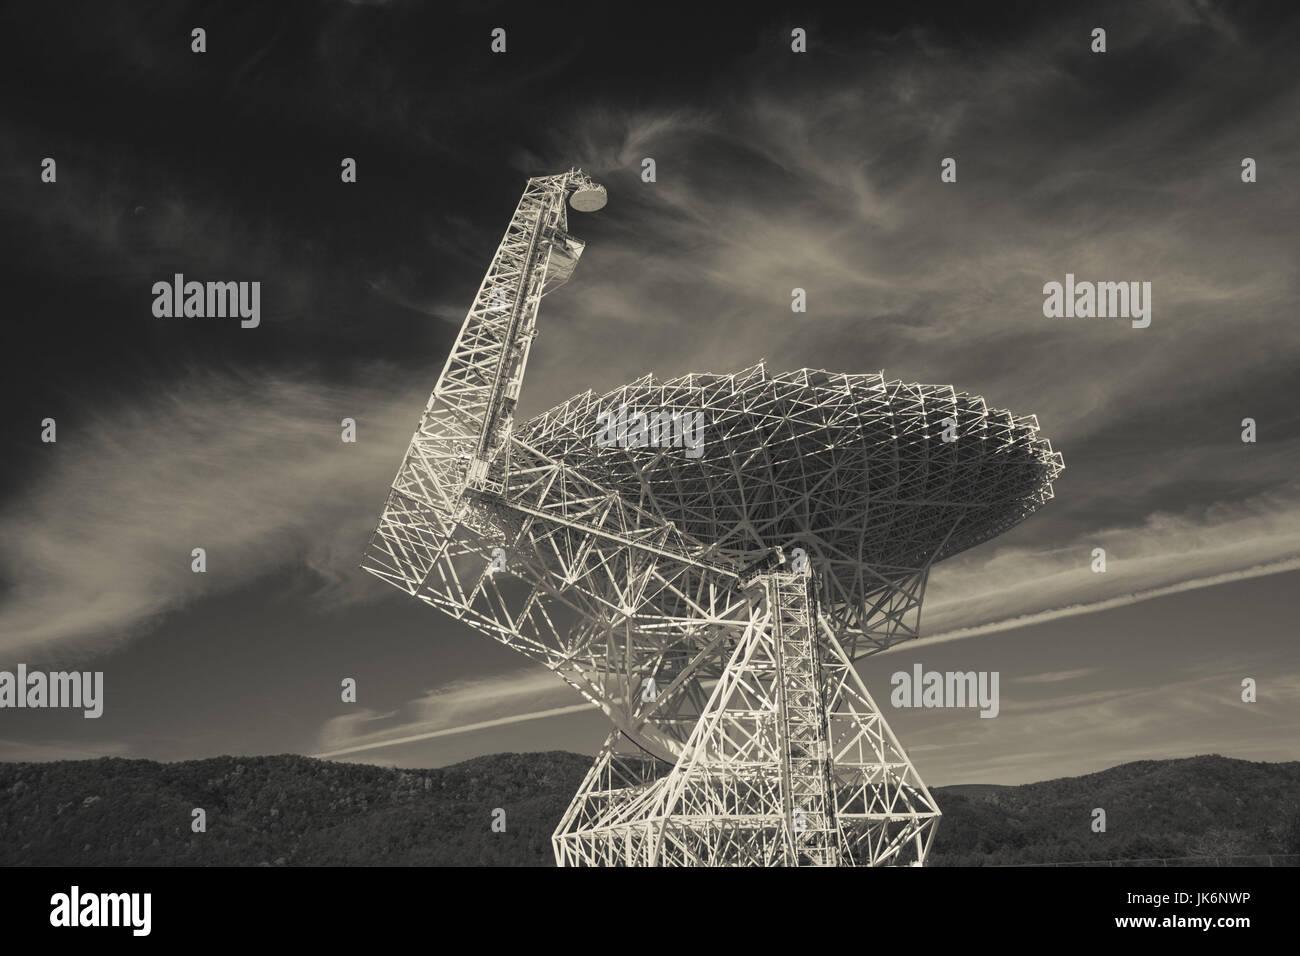 USA, West Virginia, Green Bank, National Radio Astronomy Observatory, Robert C. Byrd Green Bank Telescope (GBT), Stock Photo